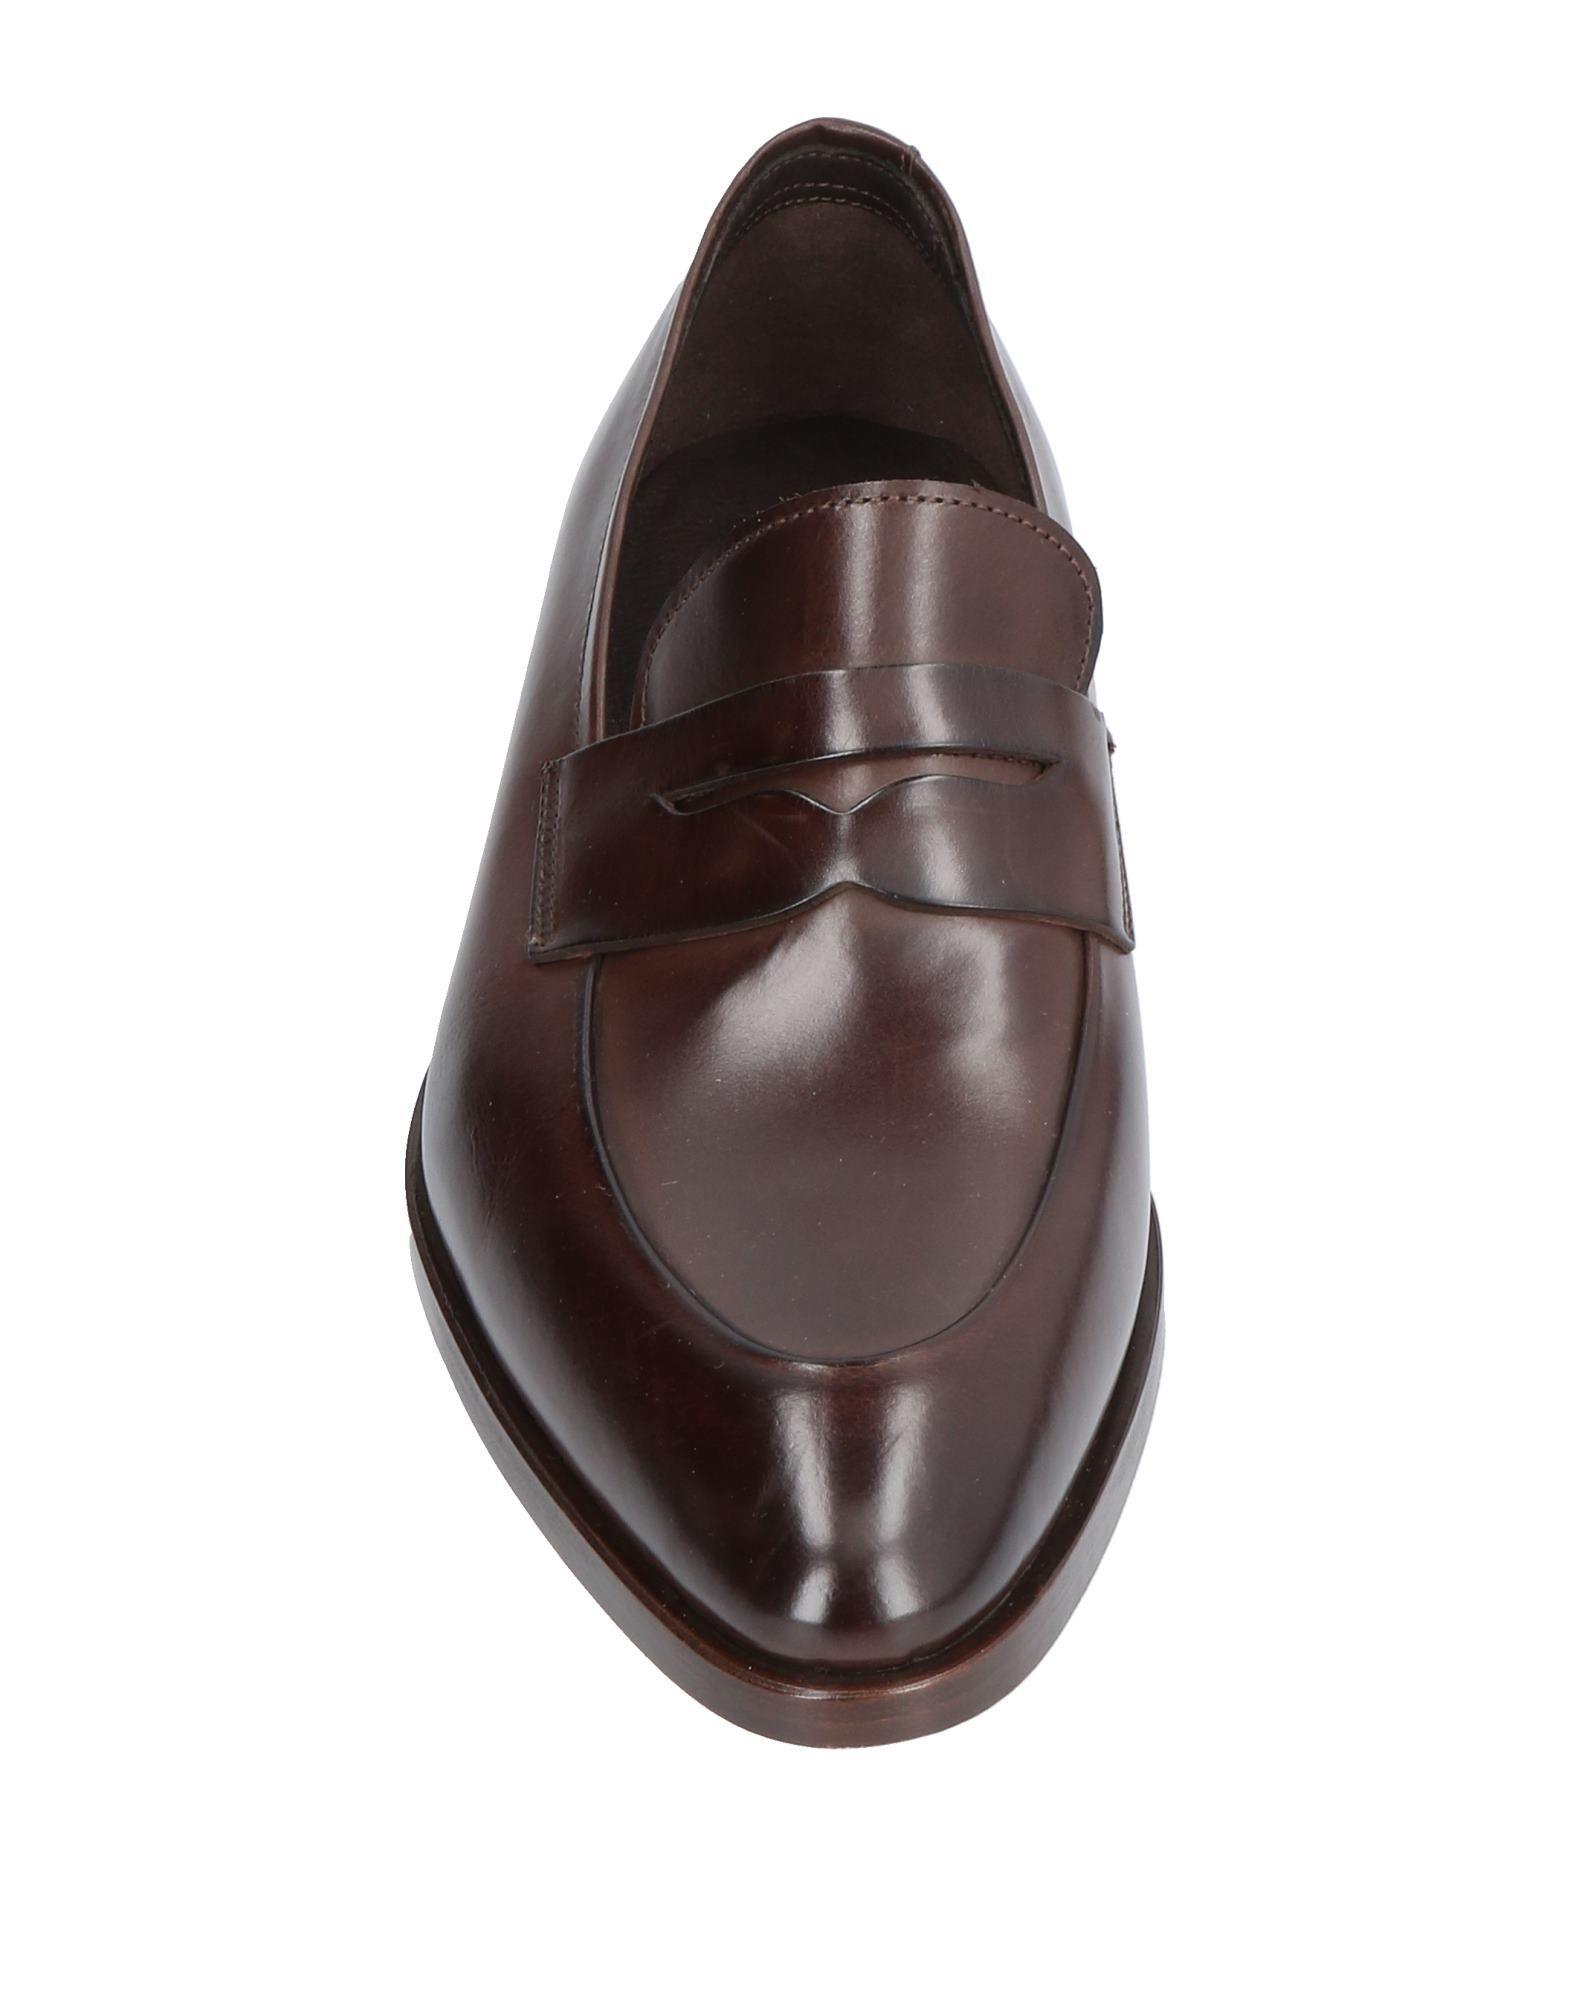 Fratelli Rossetti Mokassins Herren  11440939UJ Gute Gute Gute Qualität beliebte Schuhe 17041f